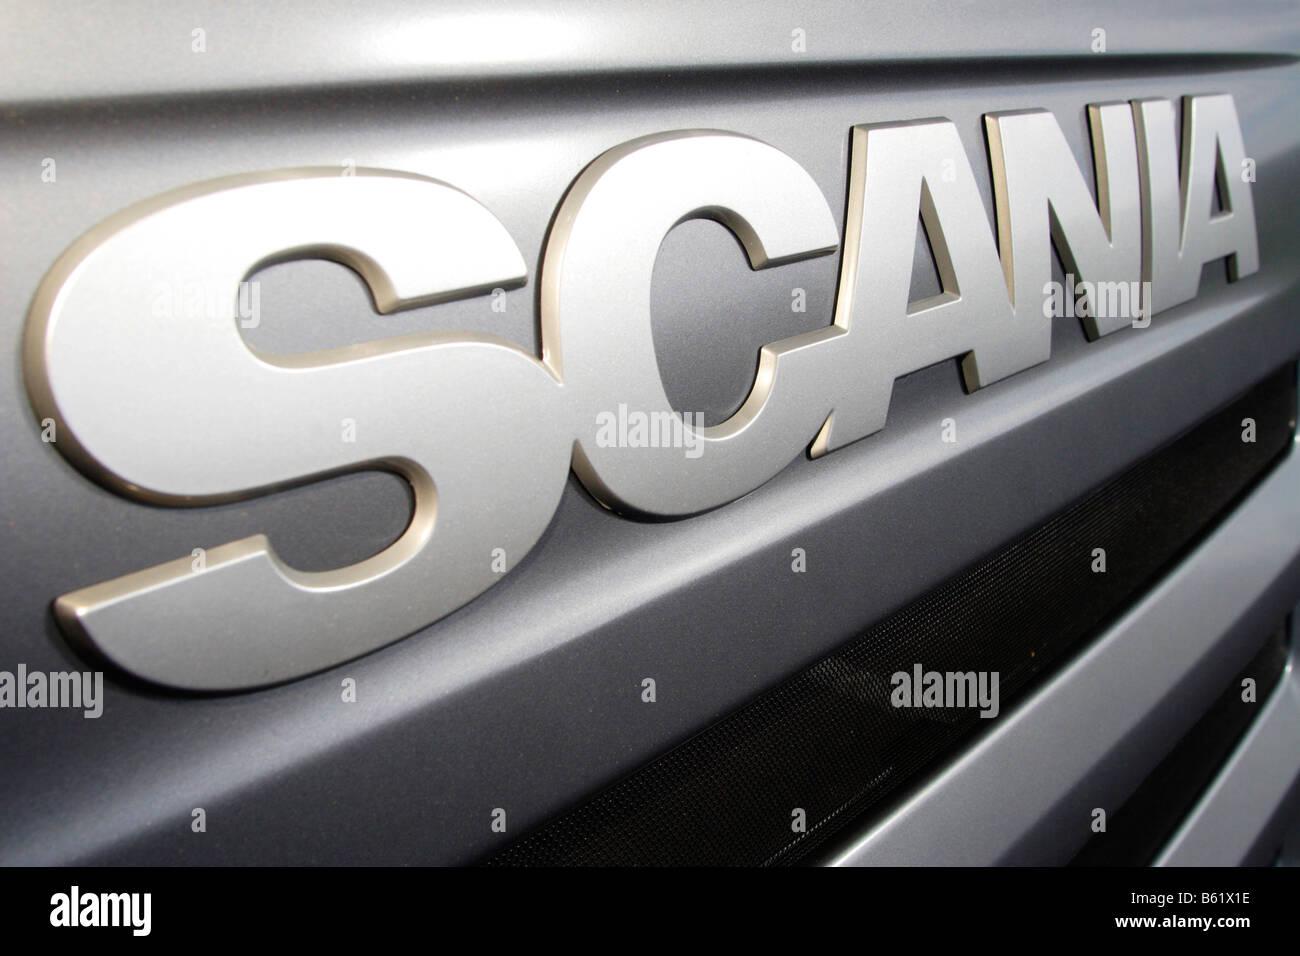 scania truck logo stock photo royalty free image